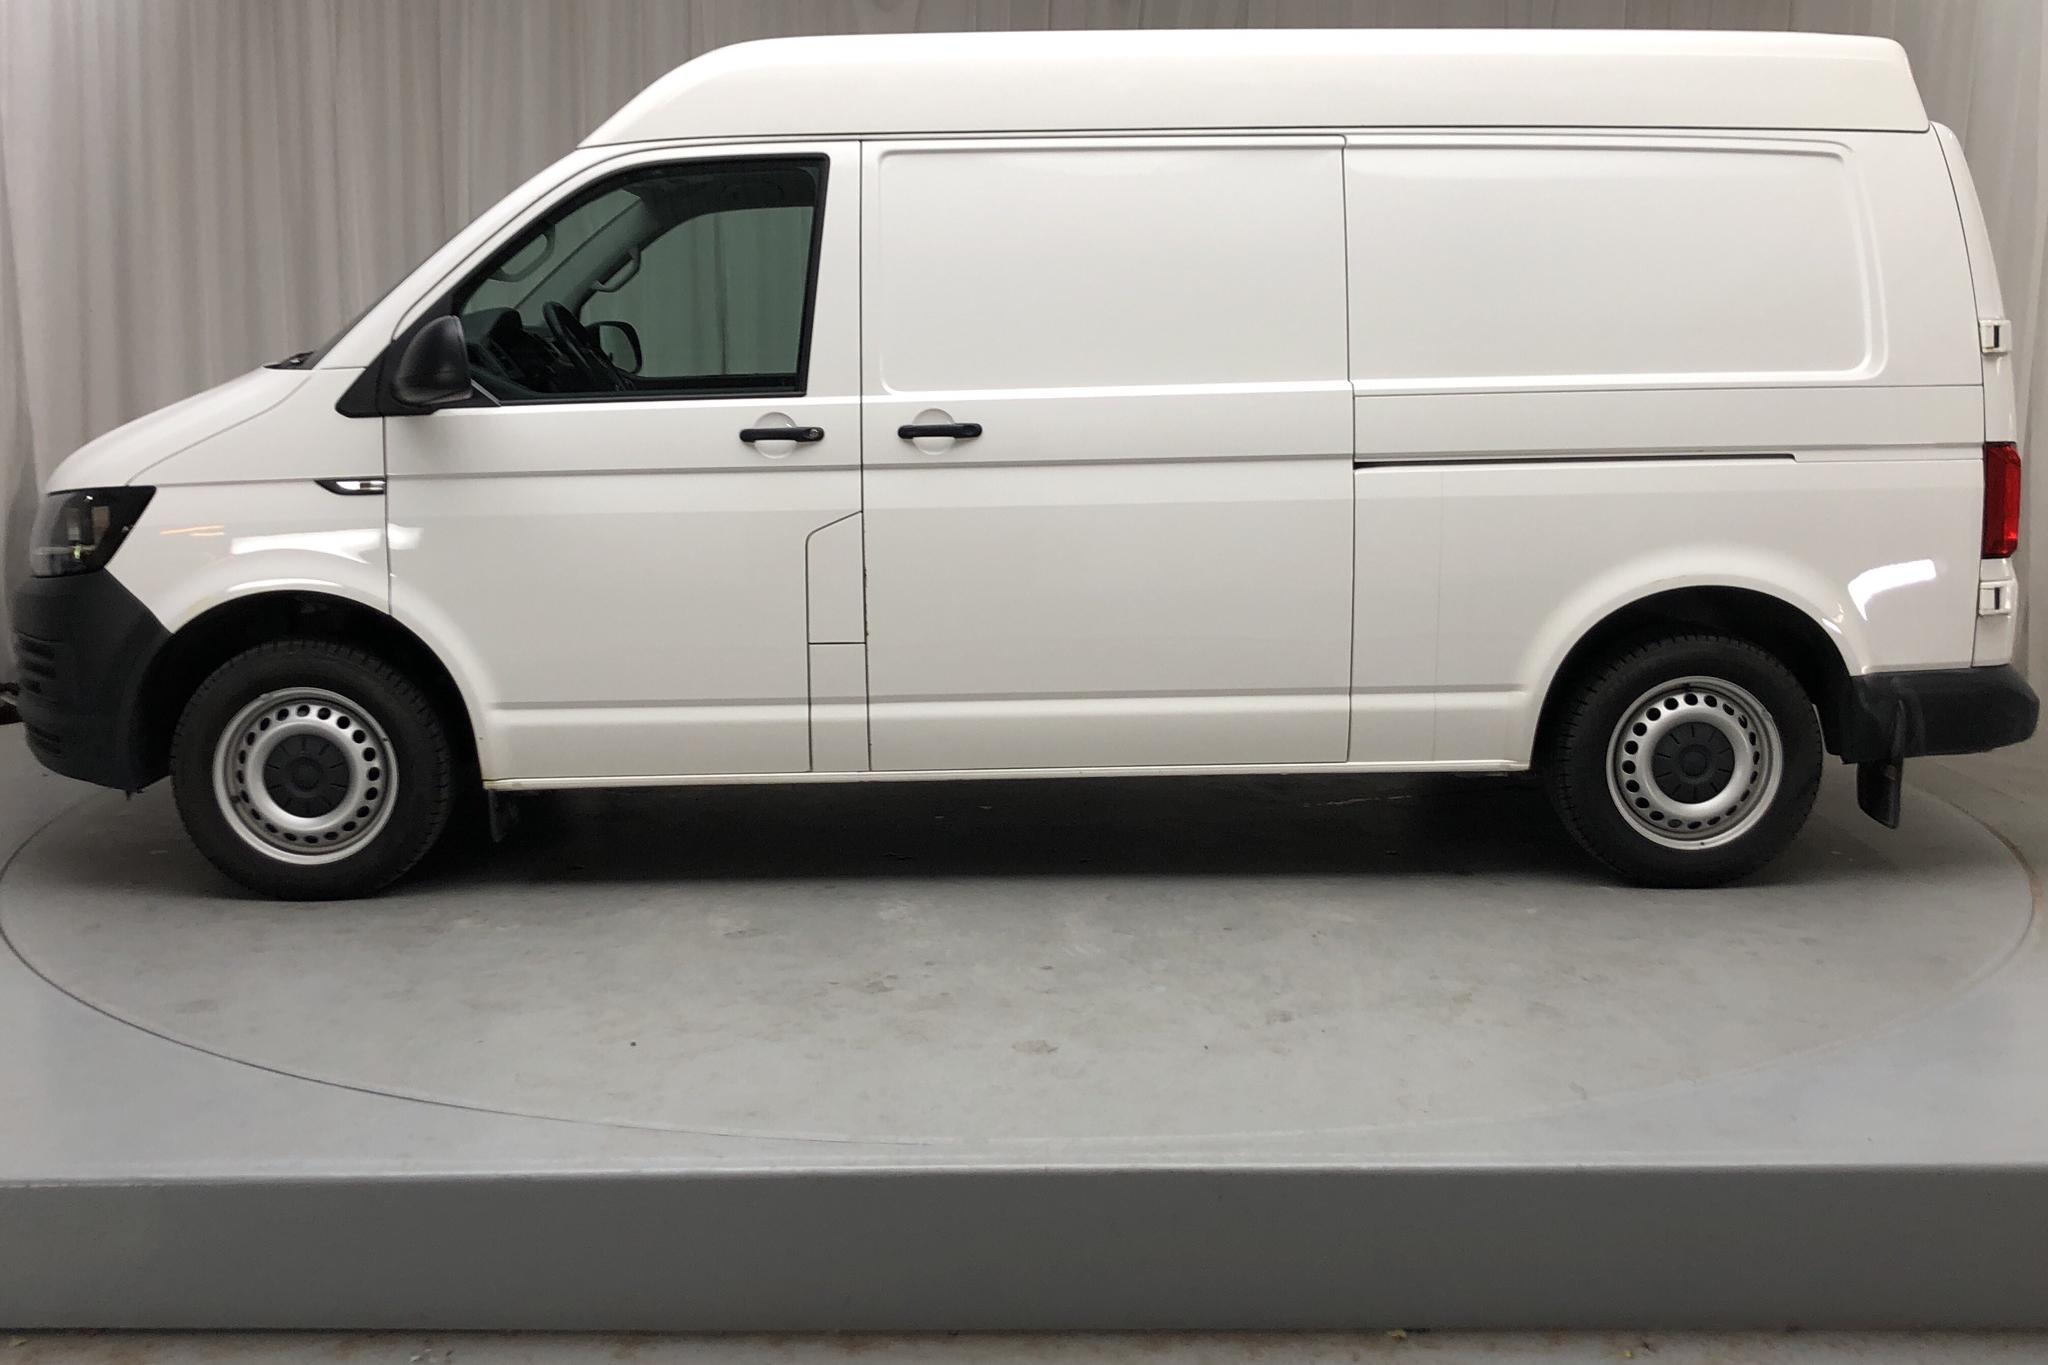 VW Transporter T6 2.0 TDI BMT Skåp (150hk) - 125 400 km - Manual - white - 2016